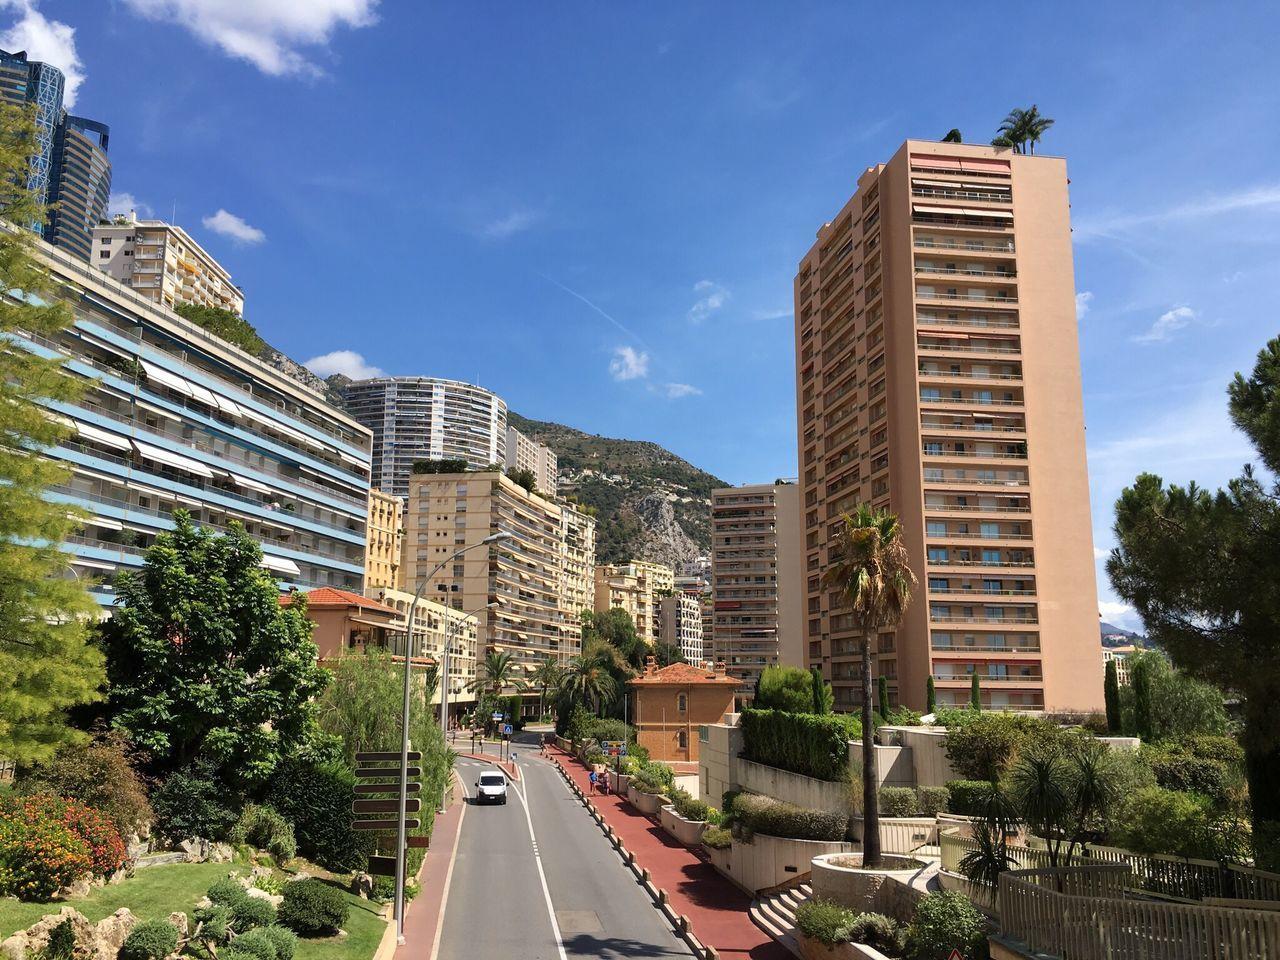 Monaco Road Architecture Built Structure Building Exterior Summer City Europe